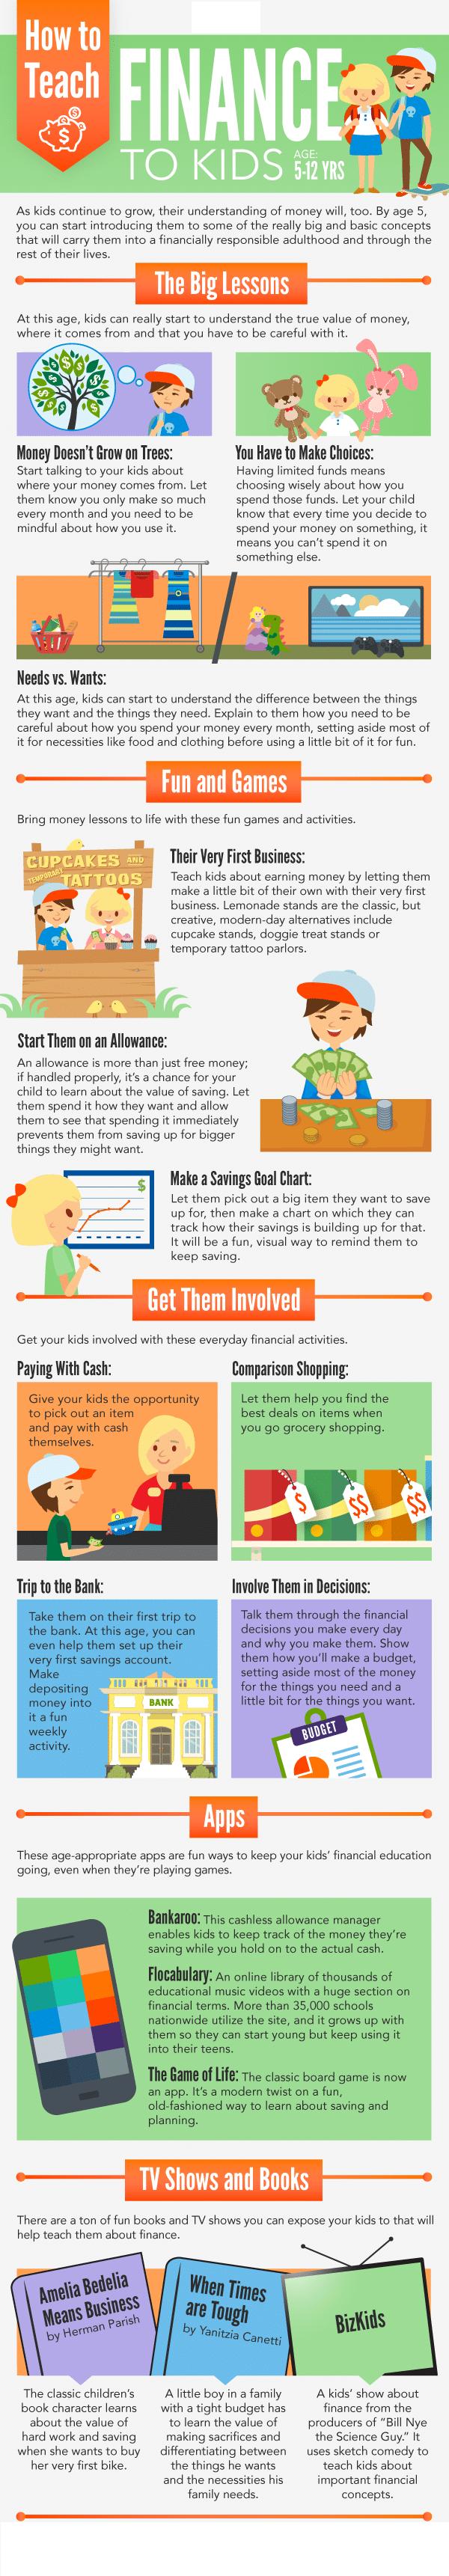 how-to-teach-finance-to-kids